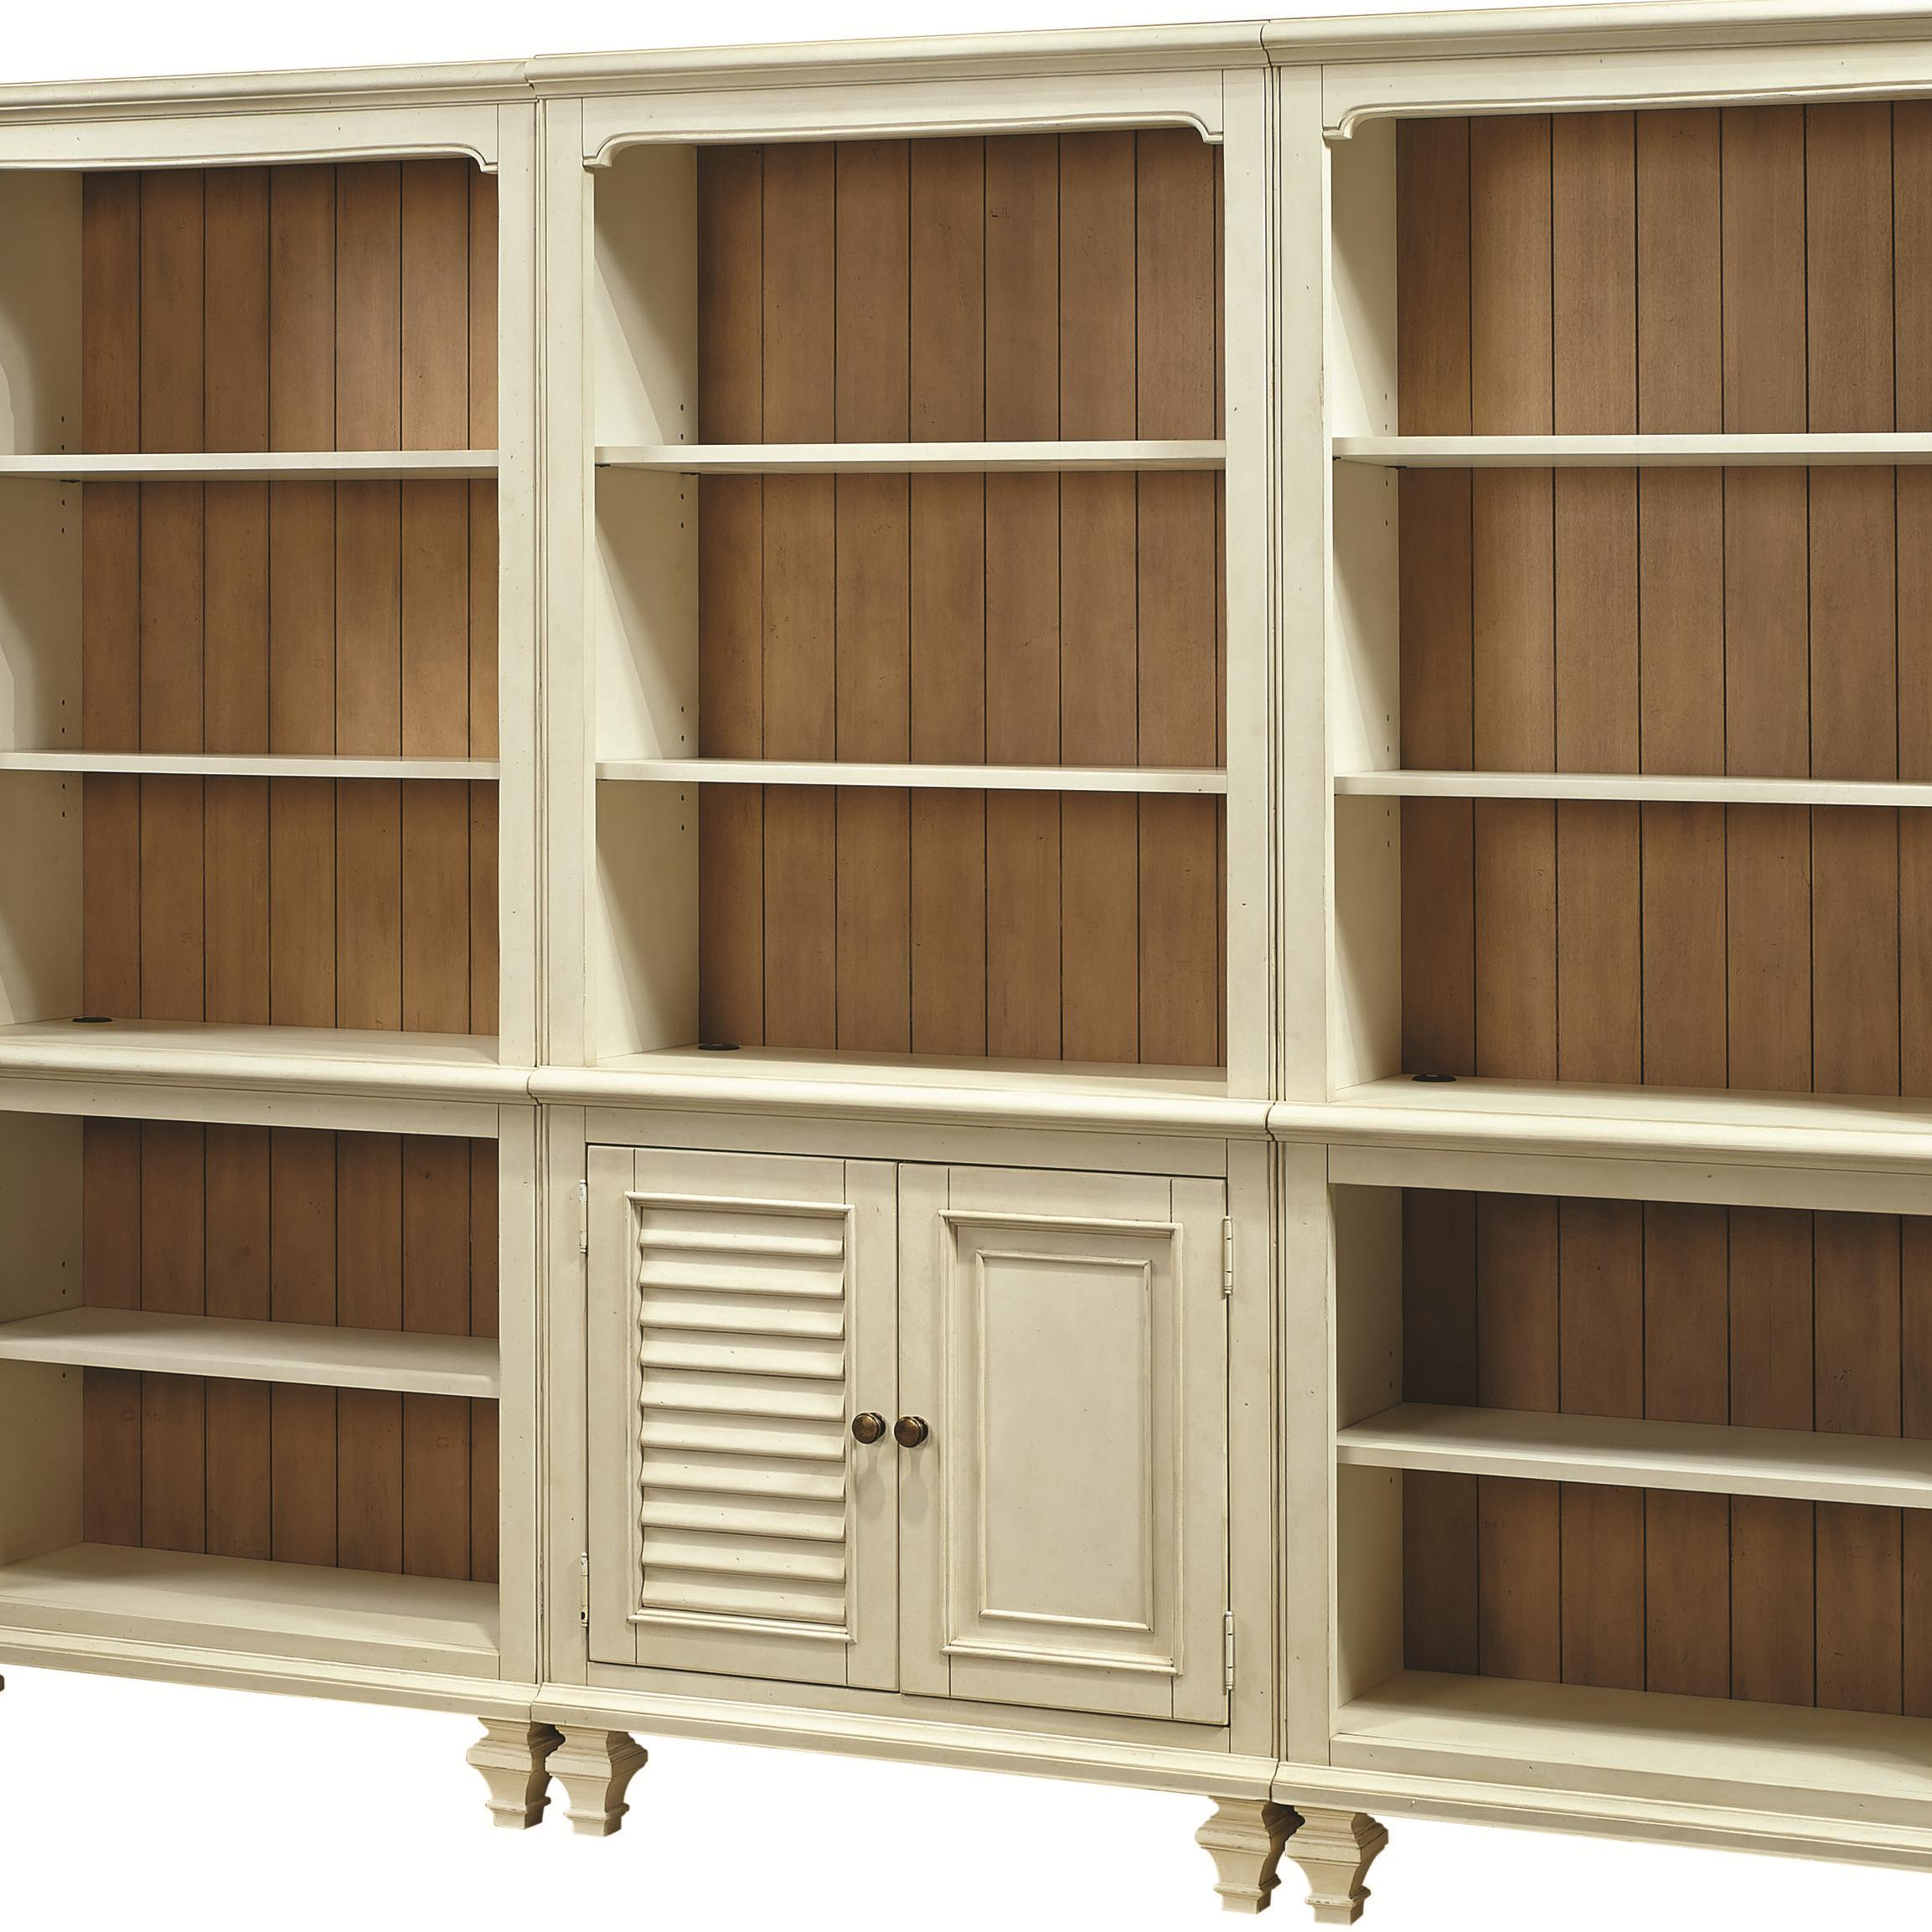 Aspenhome Cottonwood Bookcase - Item Number: I67-332